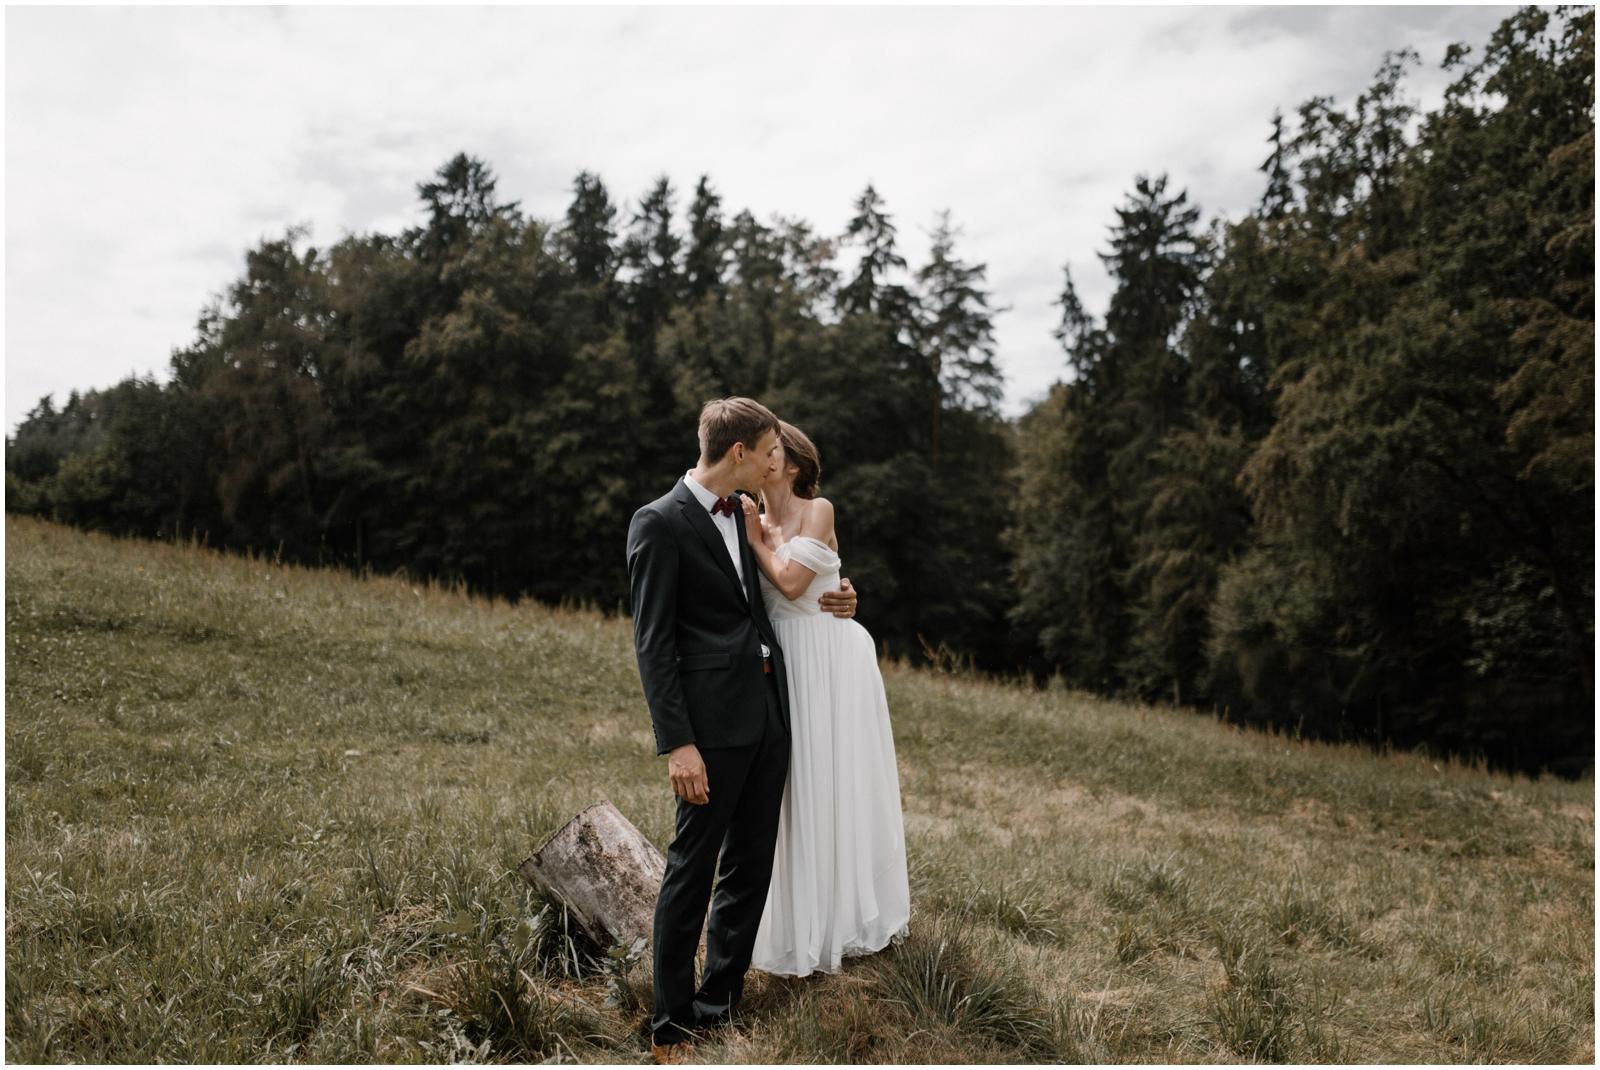 mirjam_thomas_wedding-144.jpg